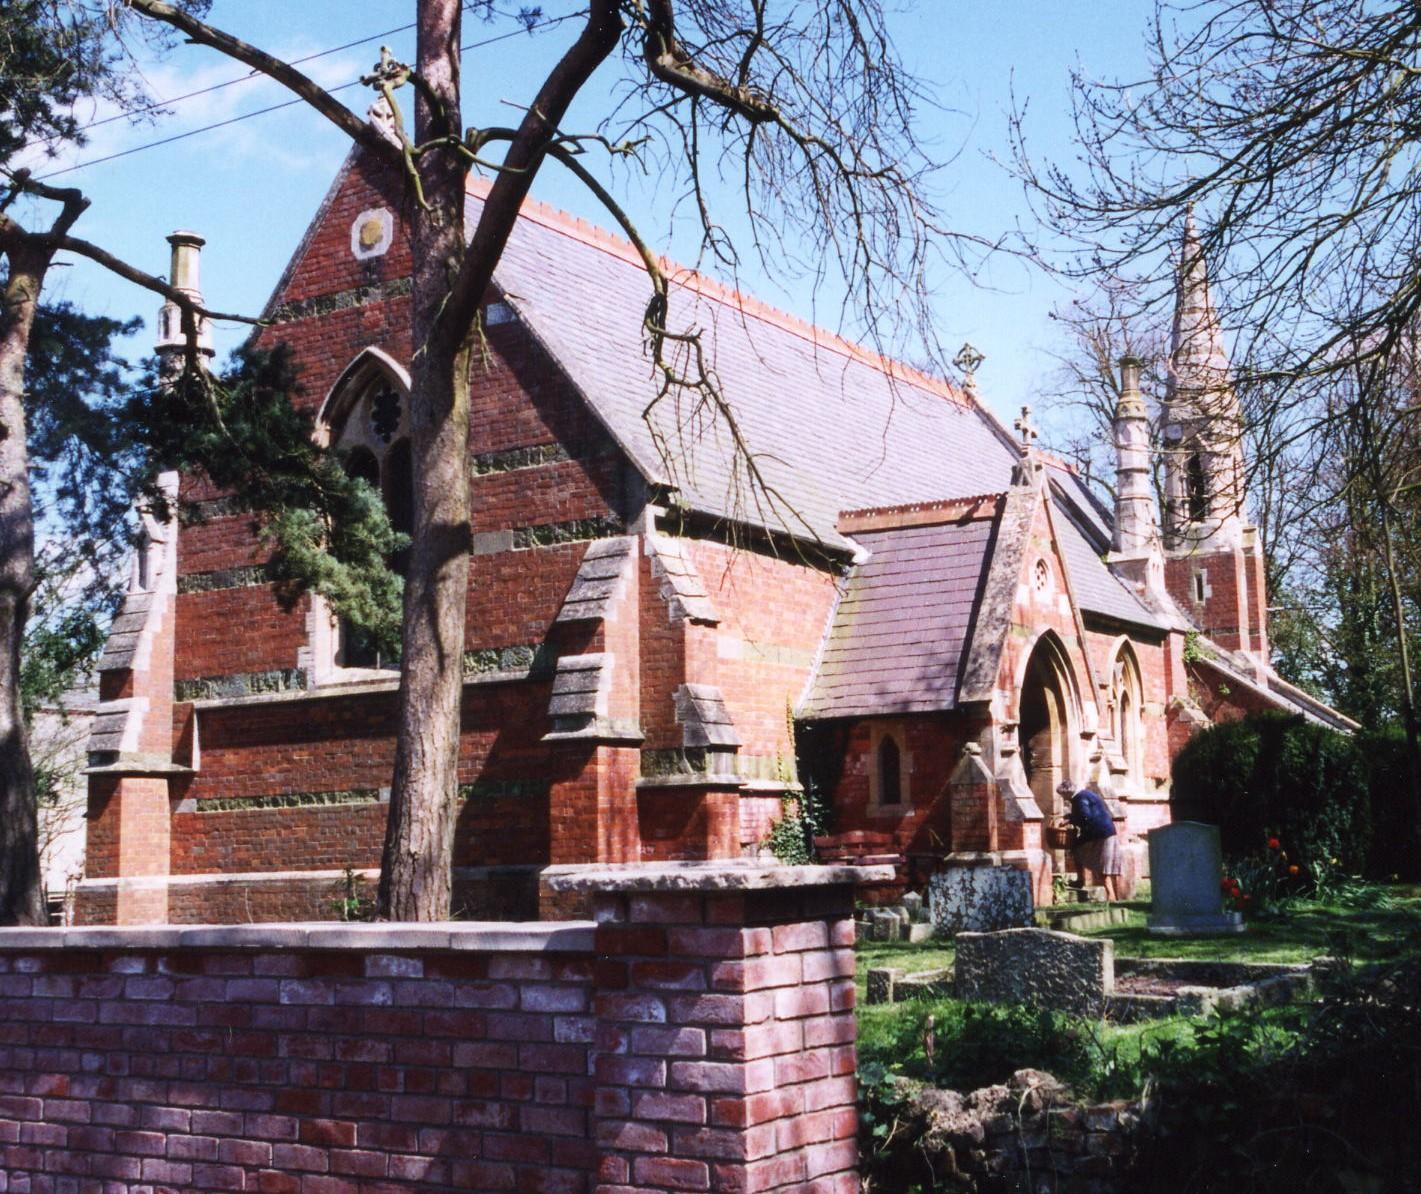 Saint Stephen's church